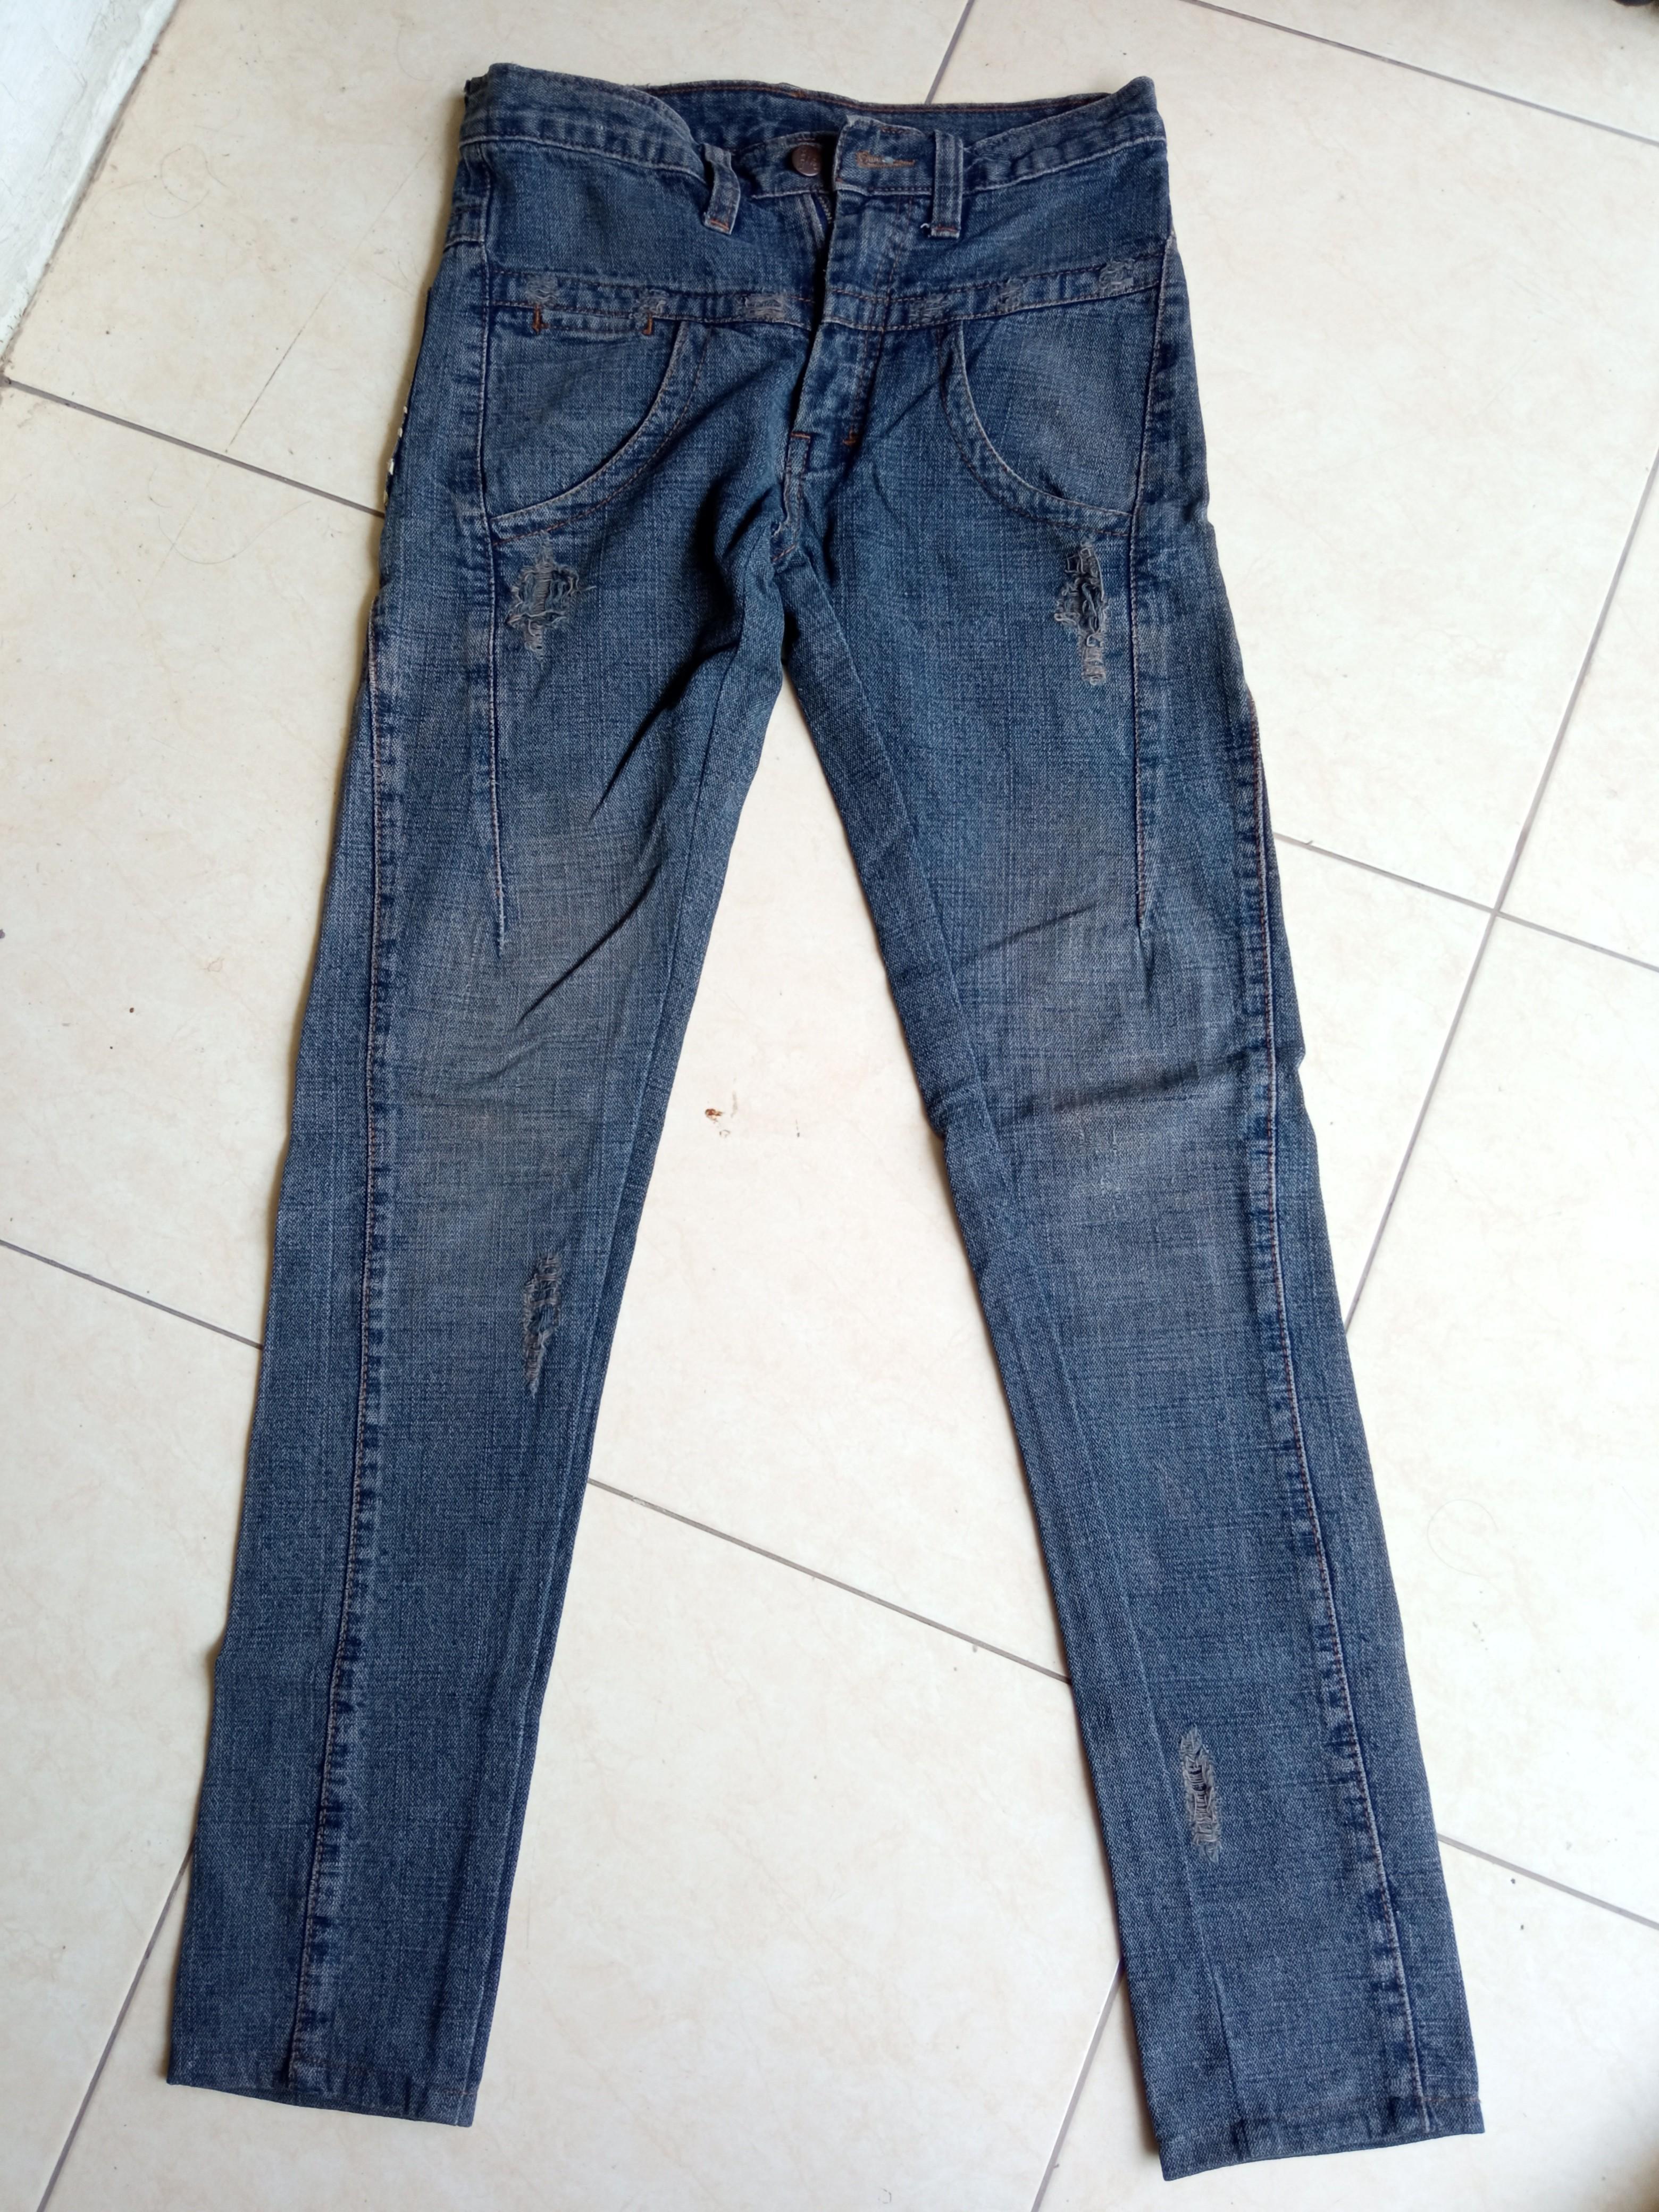 Skinny jeans points